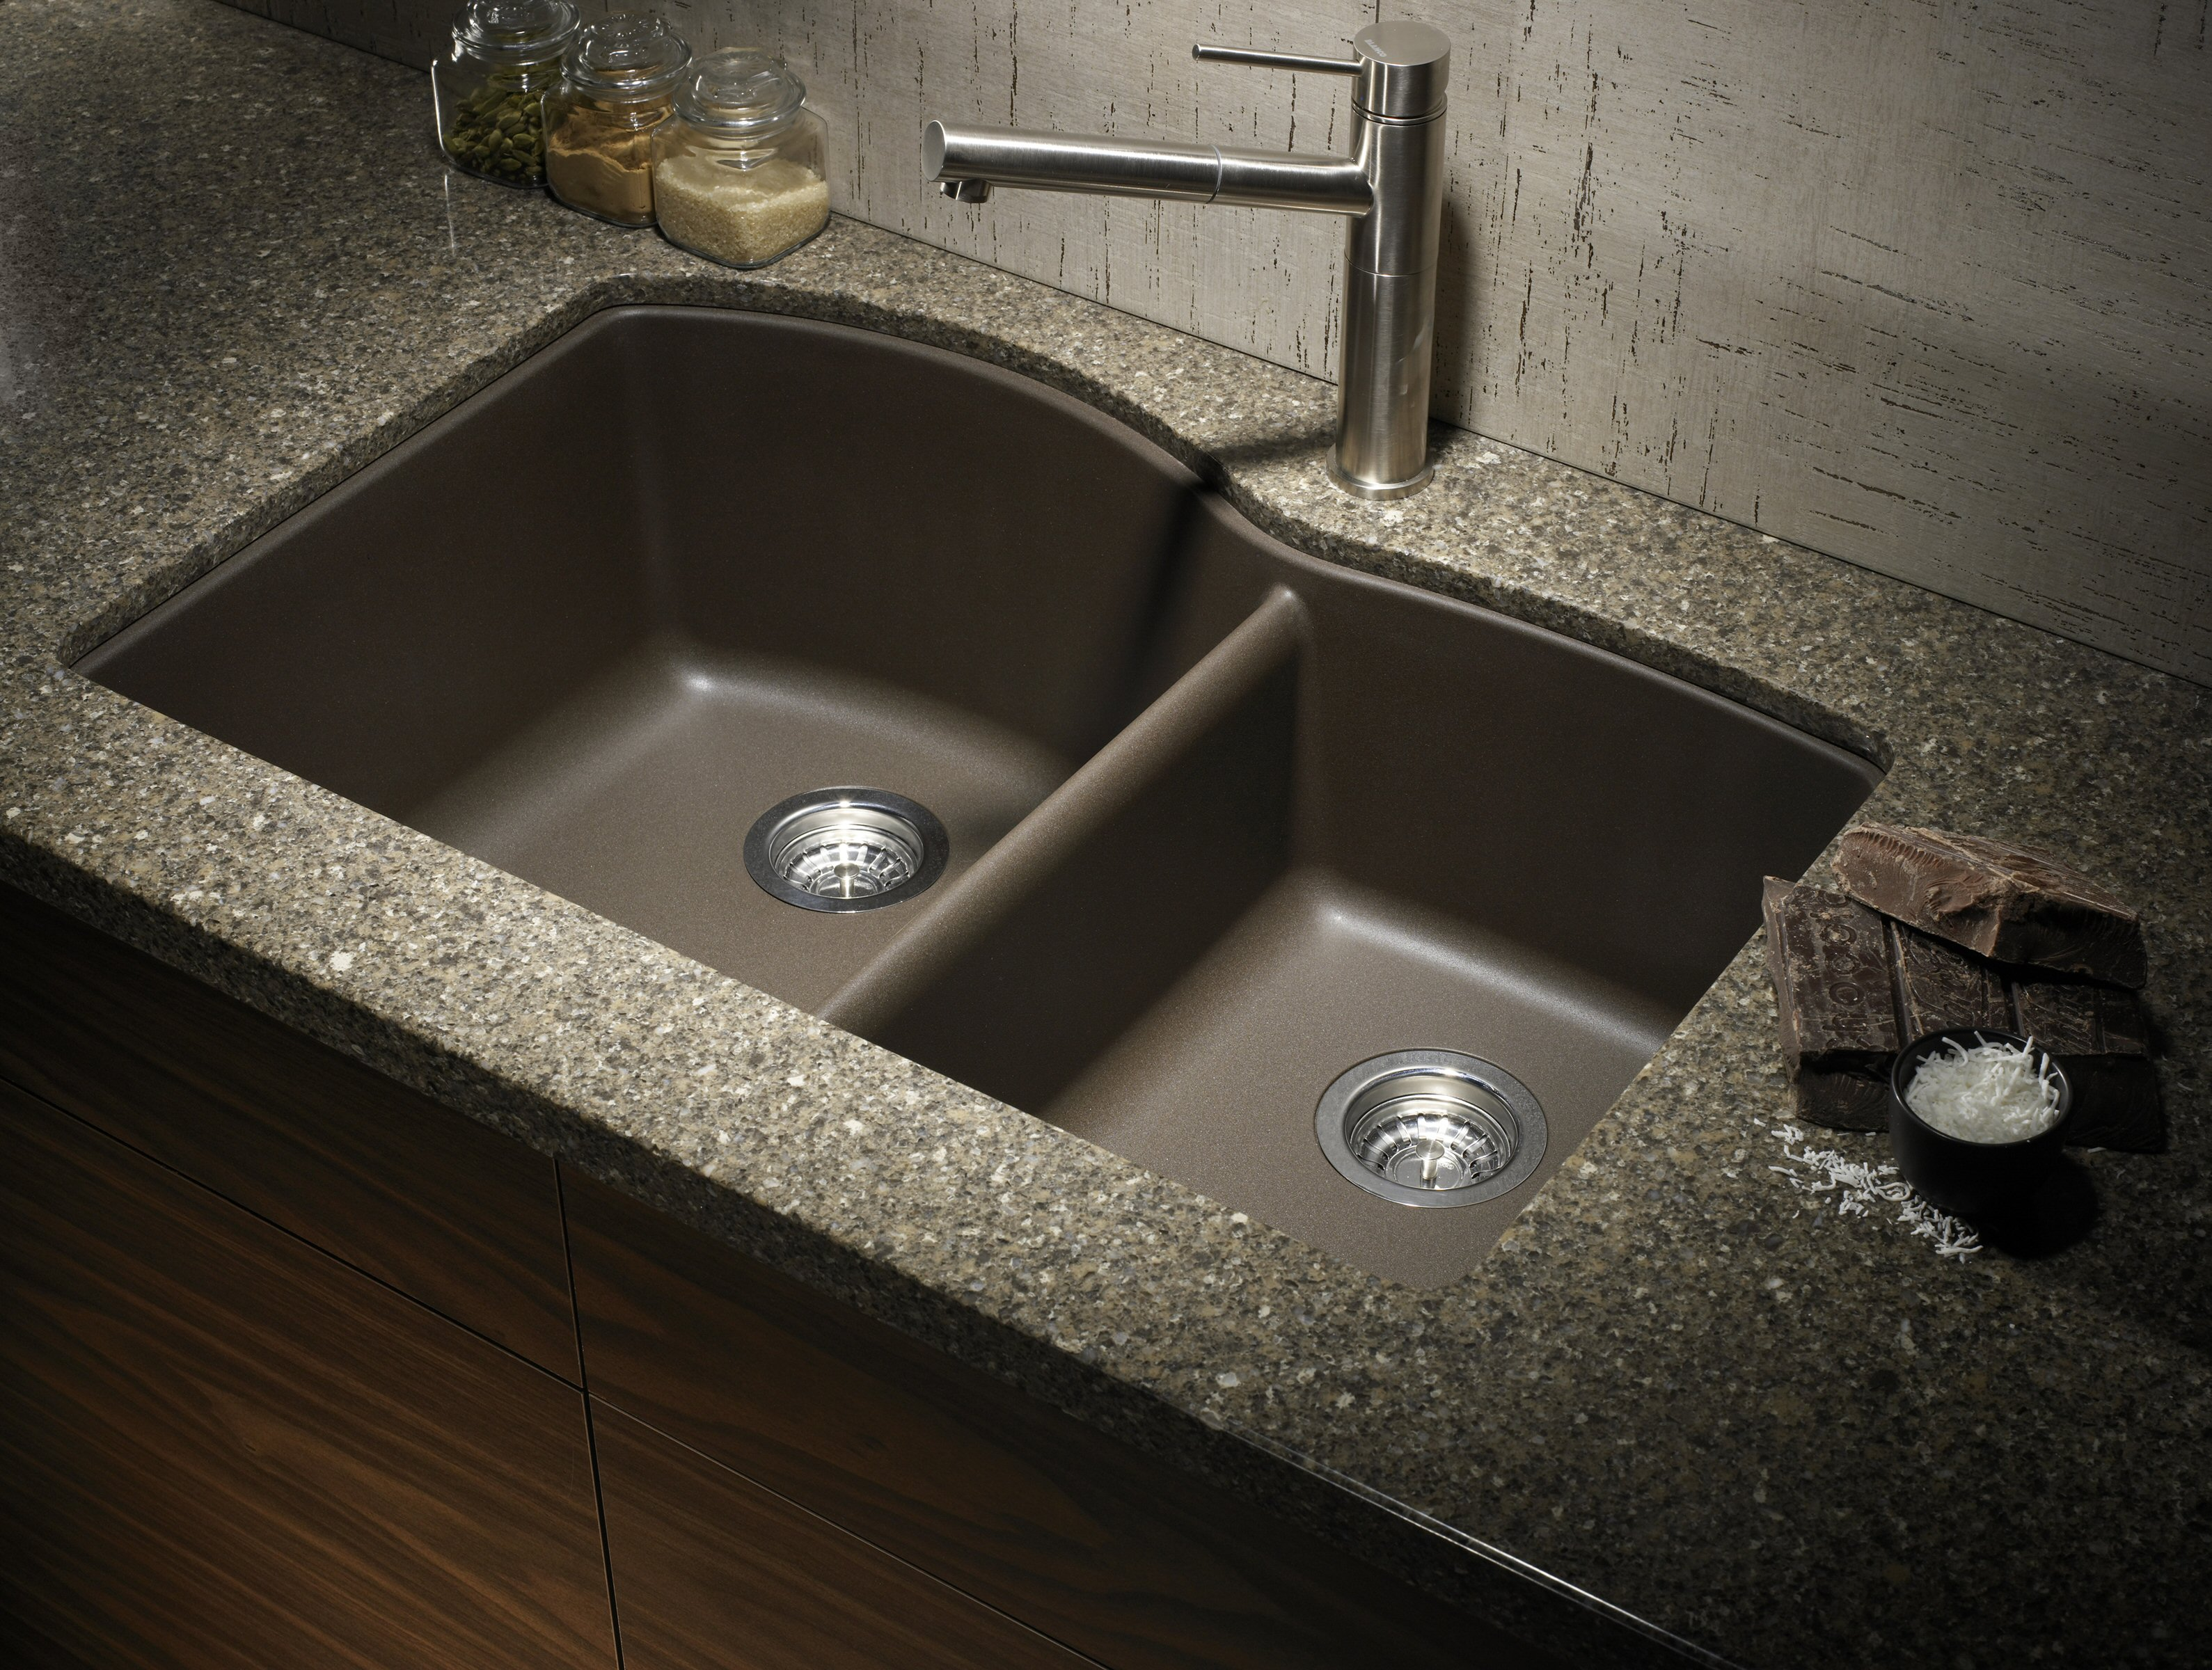 kitchen sinks home depot - terraneg